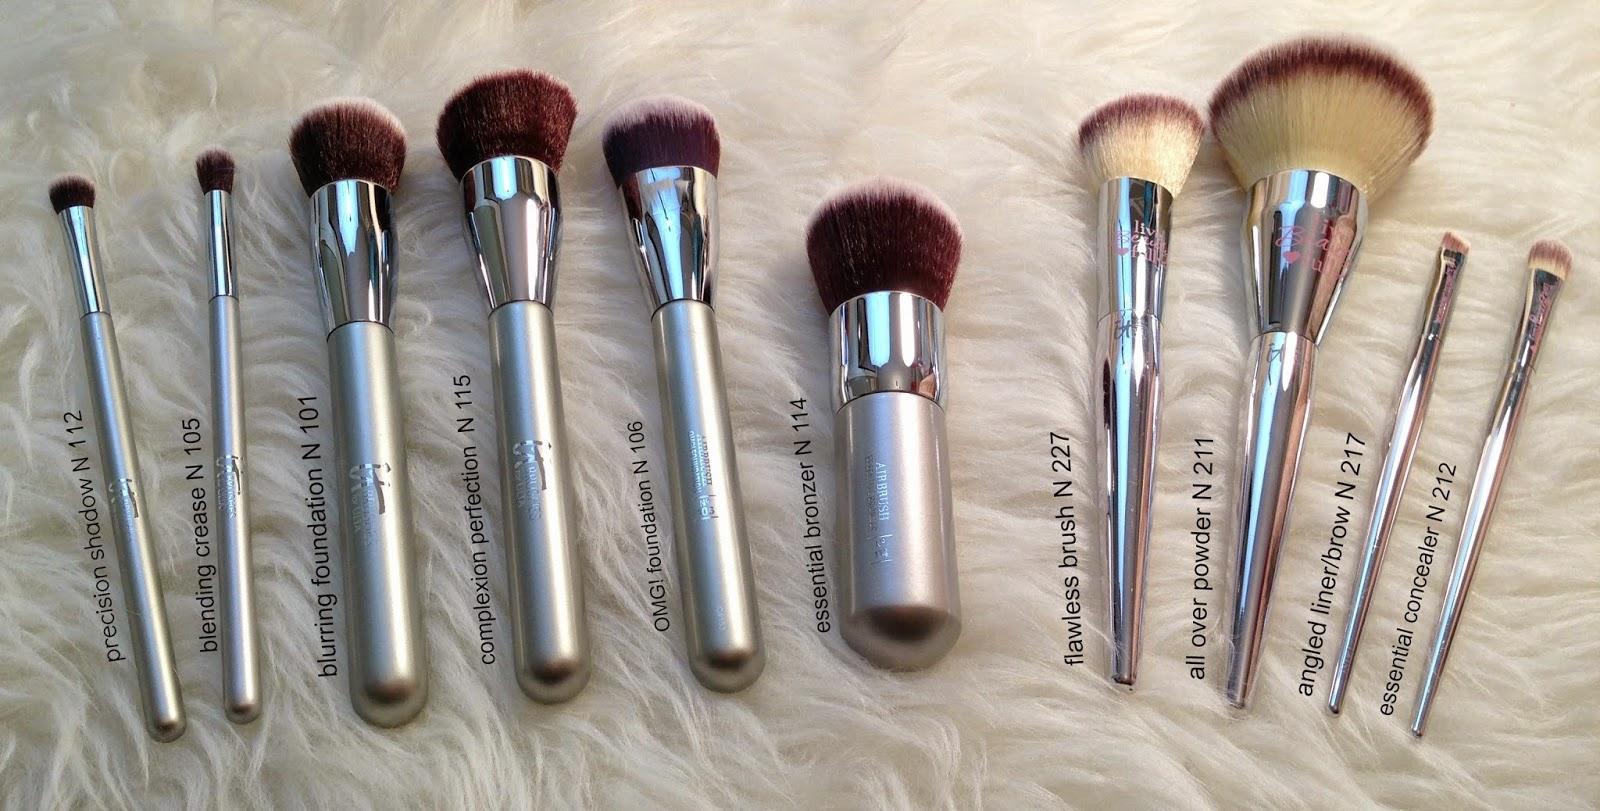 It Cosmetics x ULTA Love Beauty Fully Angled Liner/Brow Brush #217 by IT Cosmetics #22